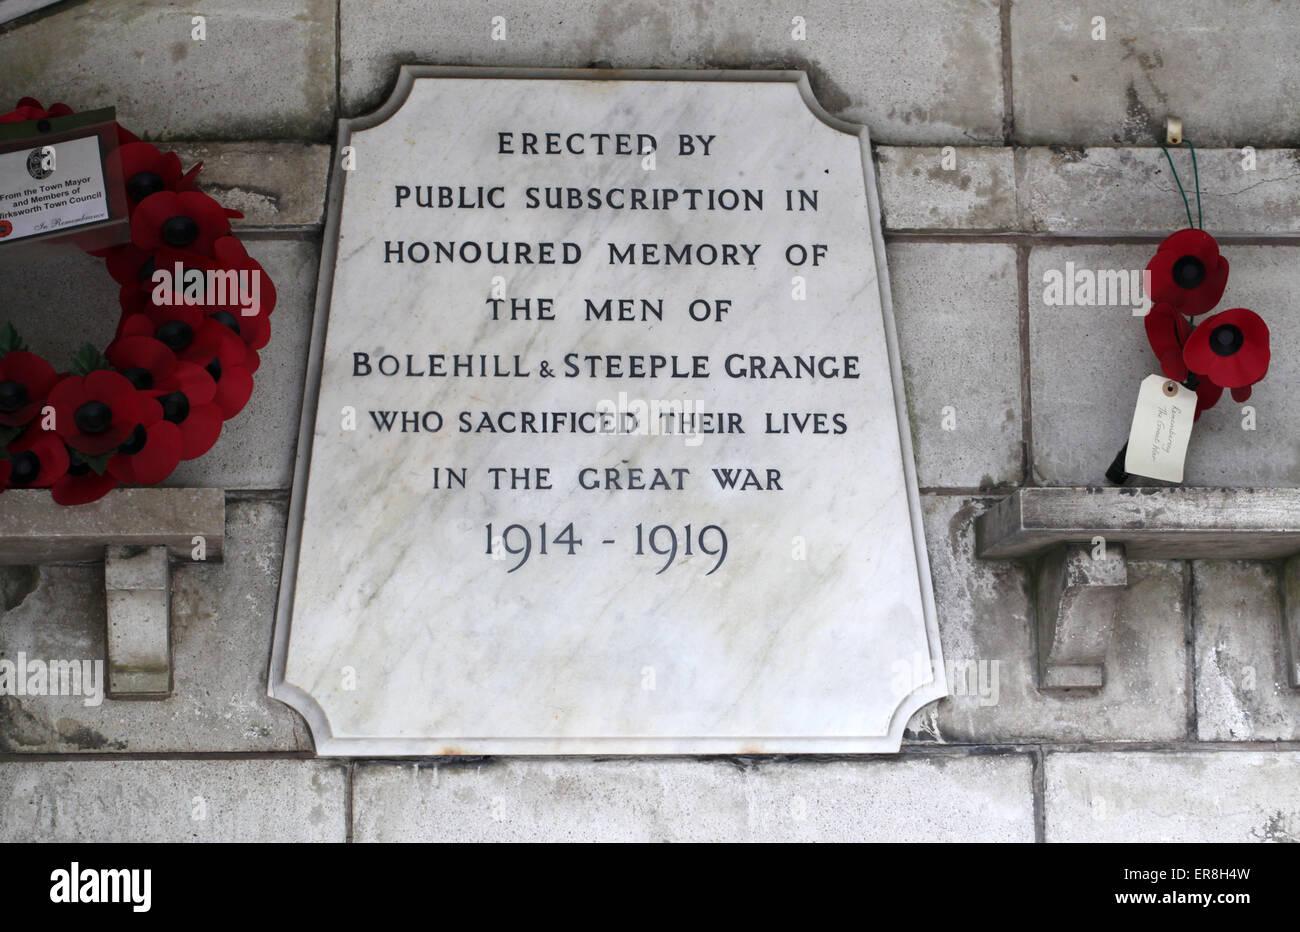 Bolehill and Steeple Grange War Memorial Plaque at Wirksworth - Stock Image